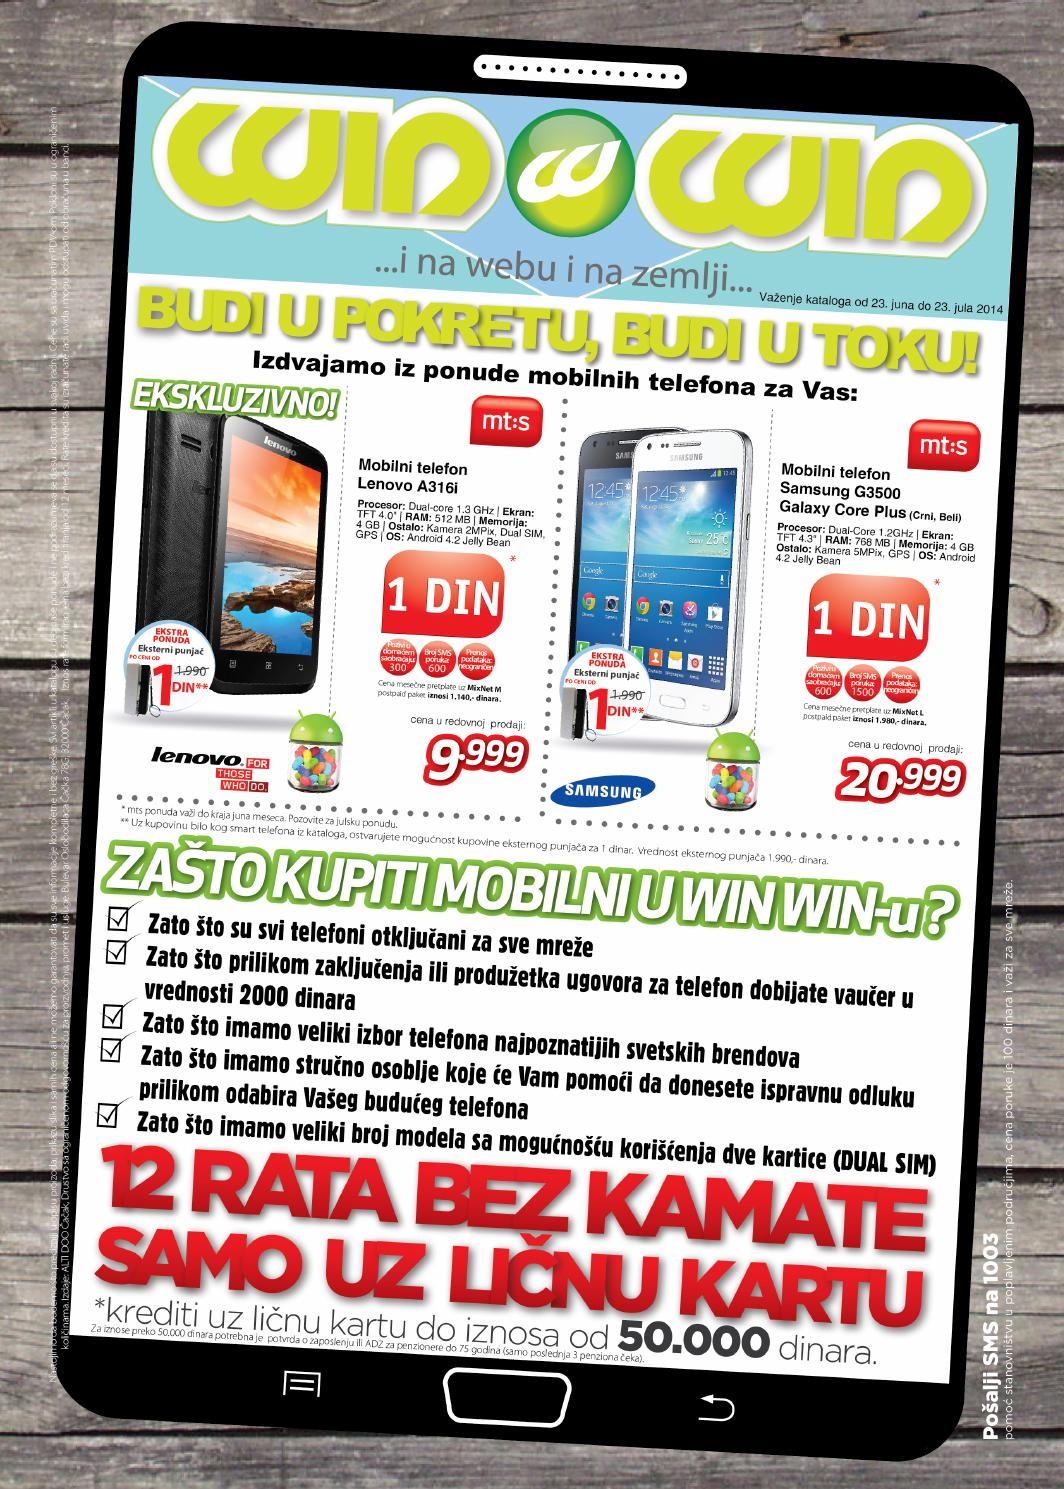 Winwin Katalog Jun Mobilni Telefoni By Winwin Shop Issuu